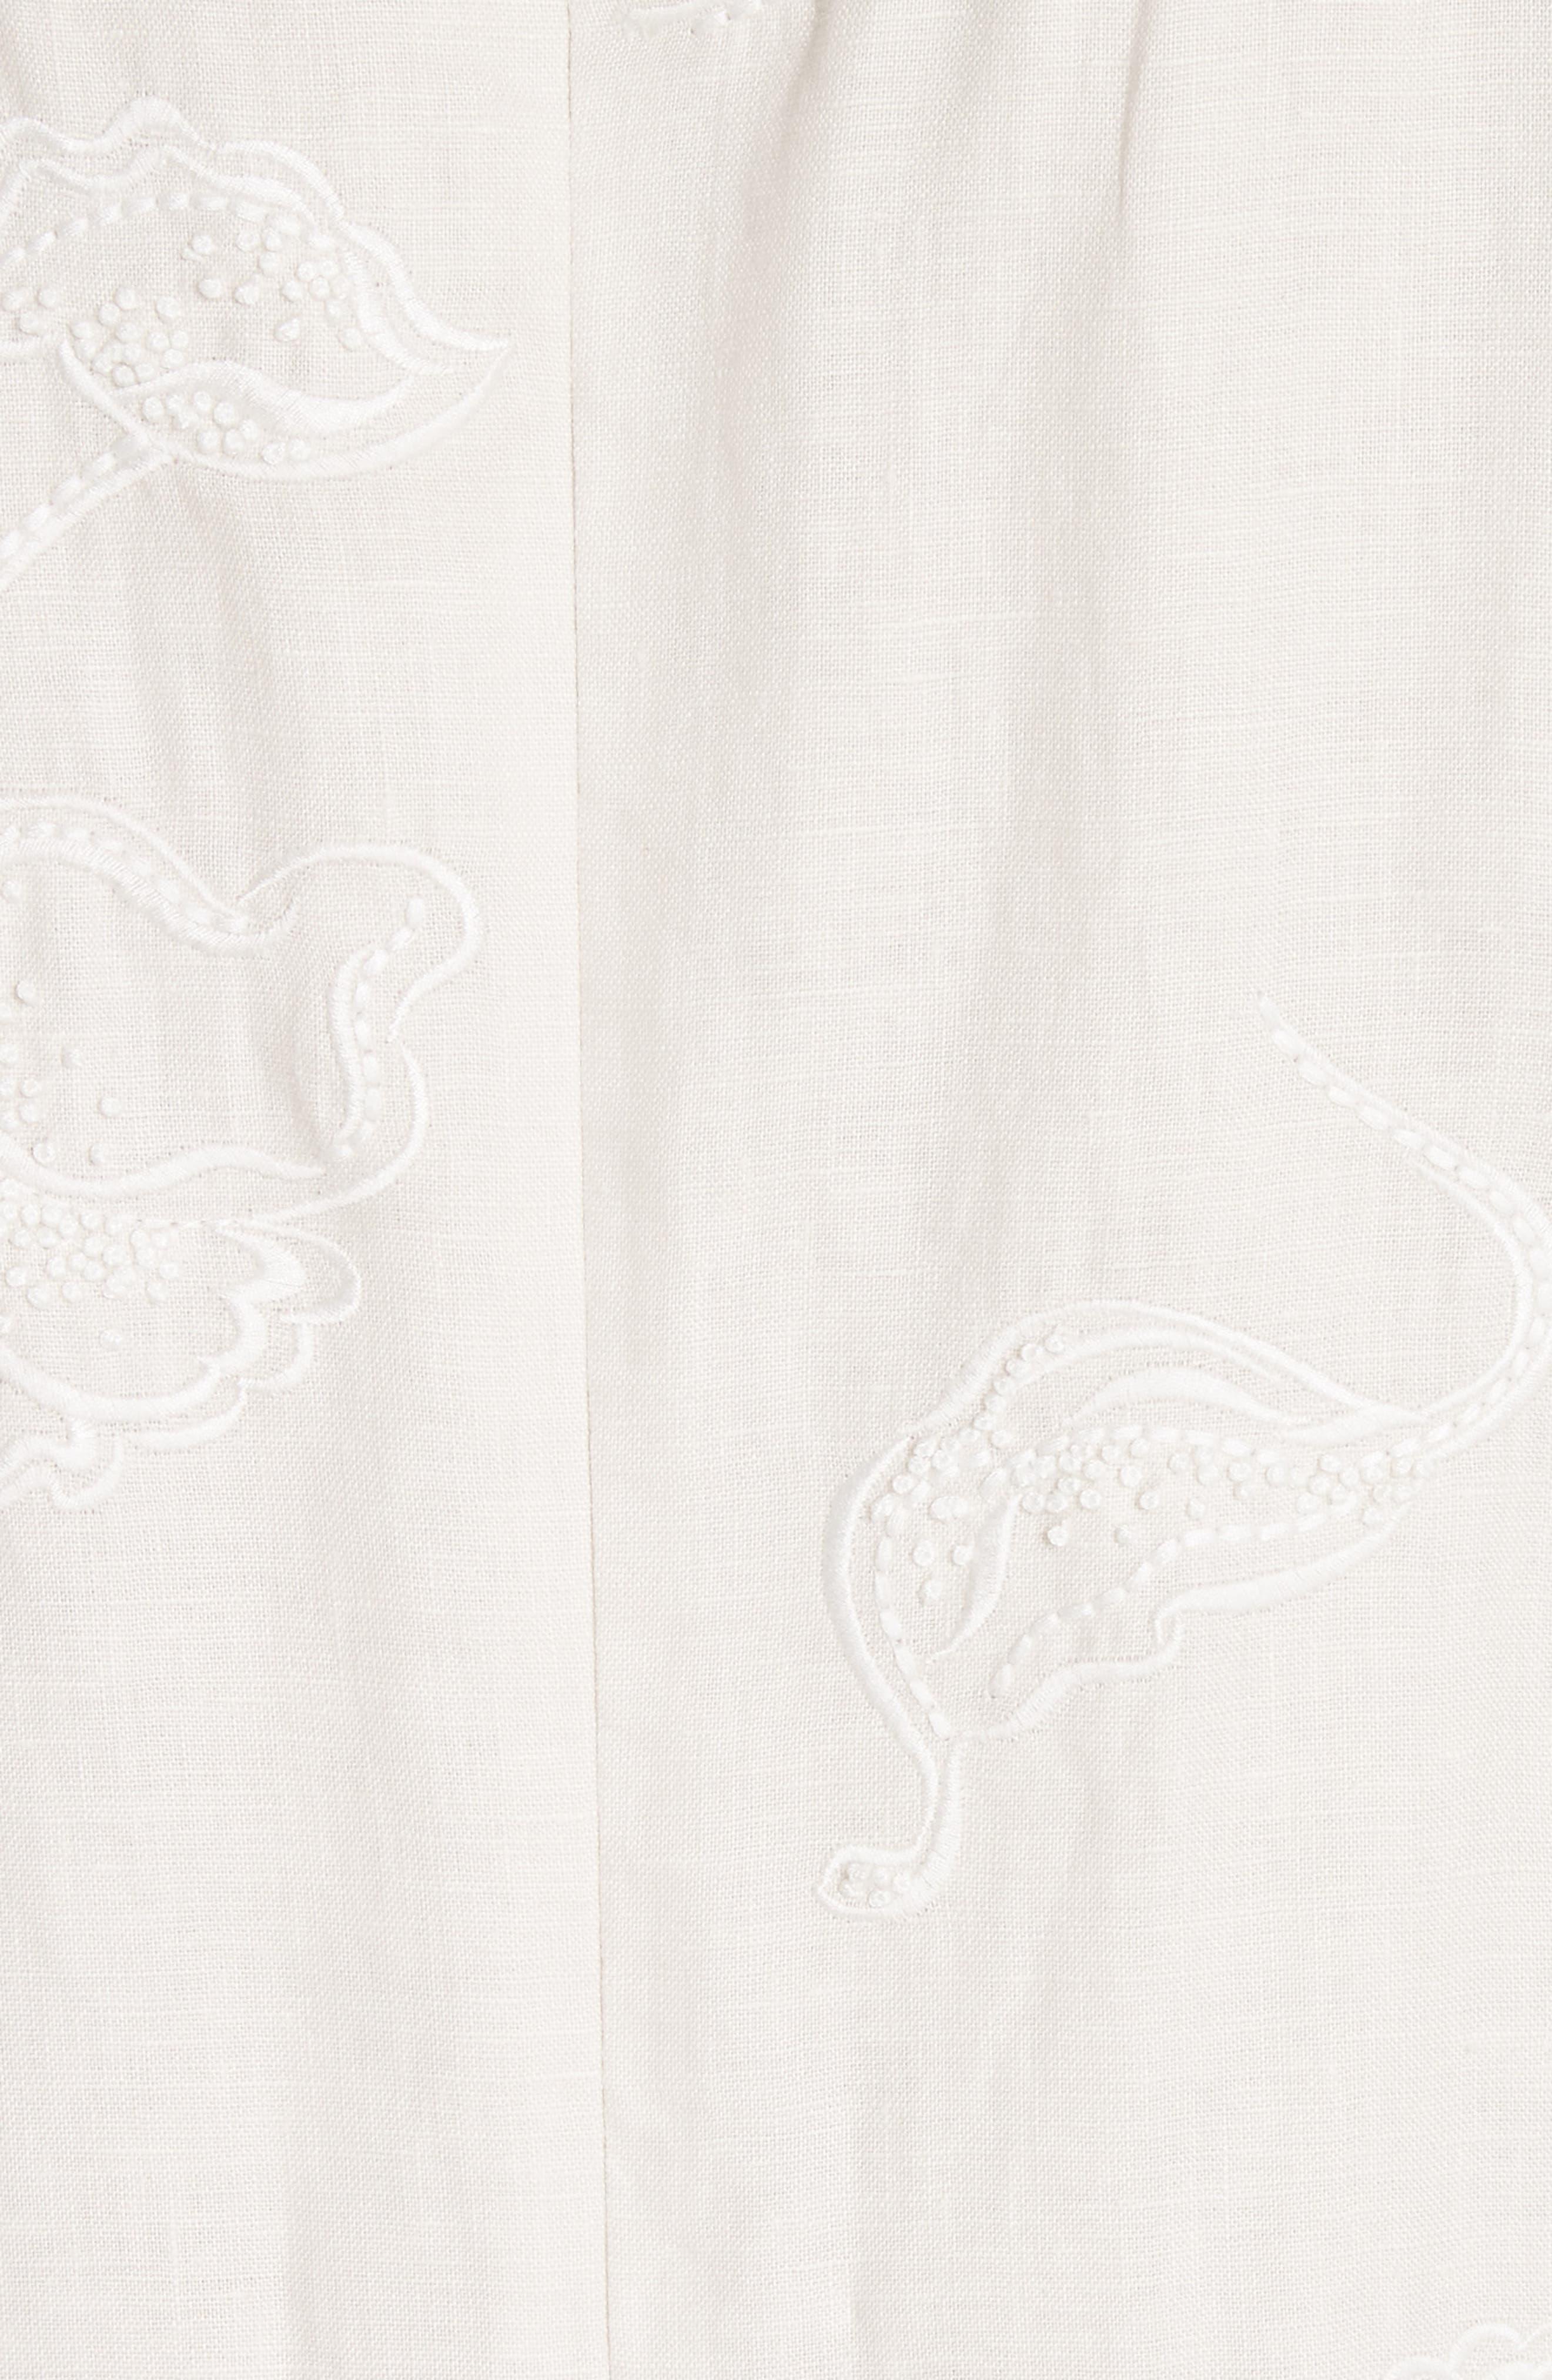 Duncan Embroidered Linen Dress,                             Alternate thumbnail 6, color,                             Raffia